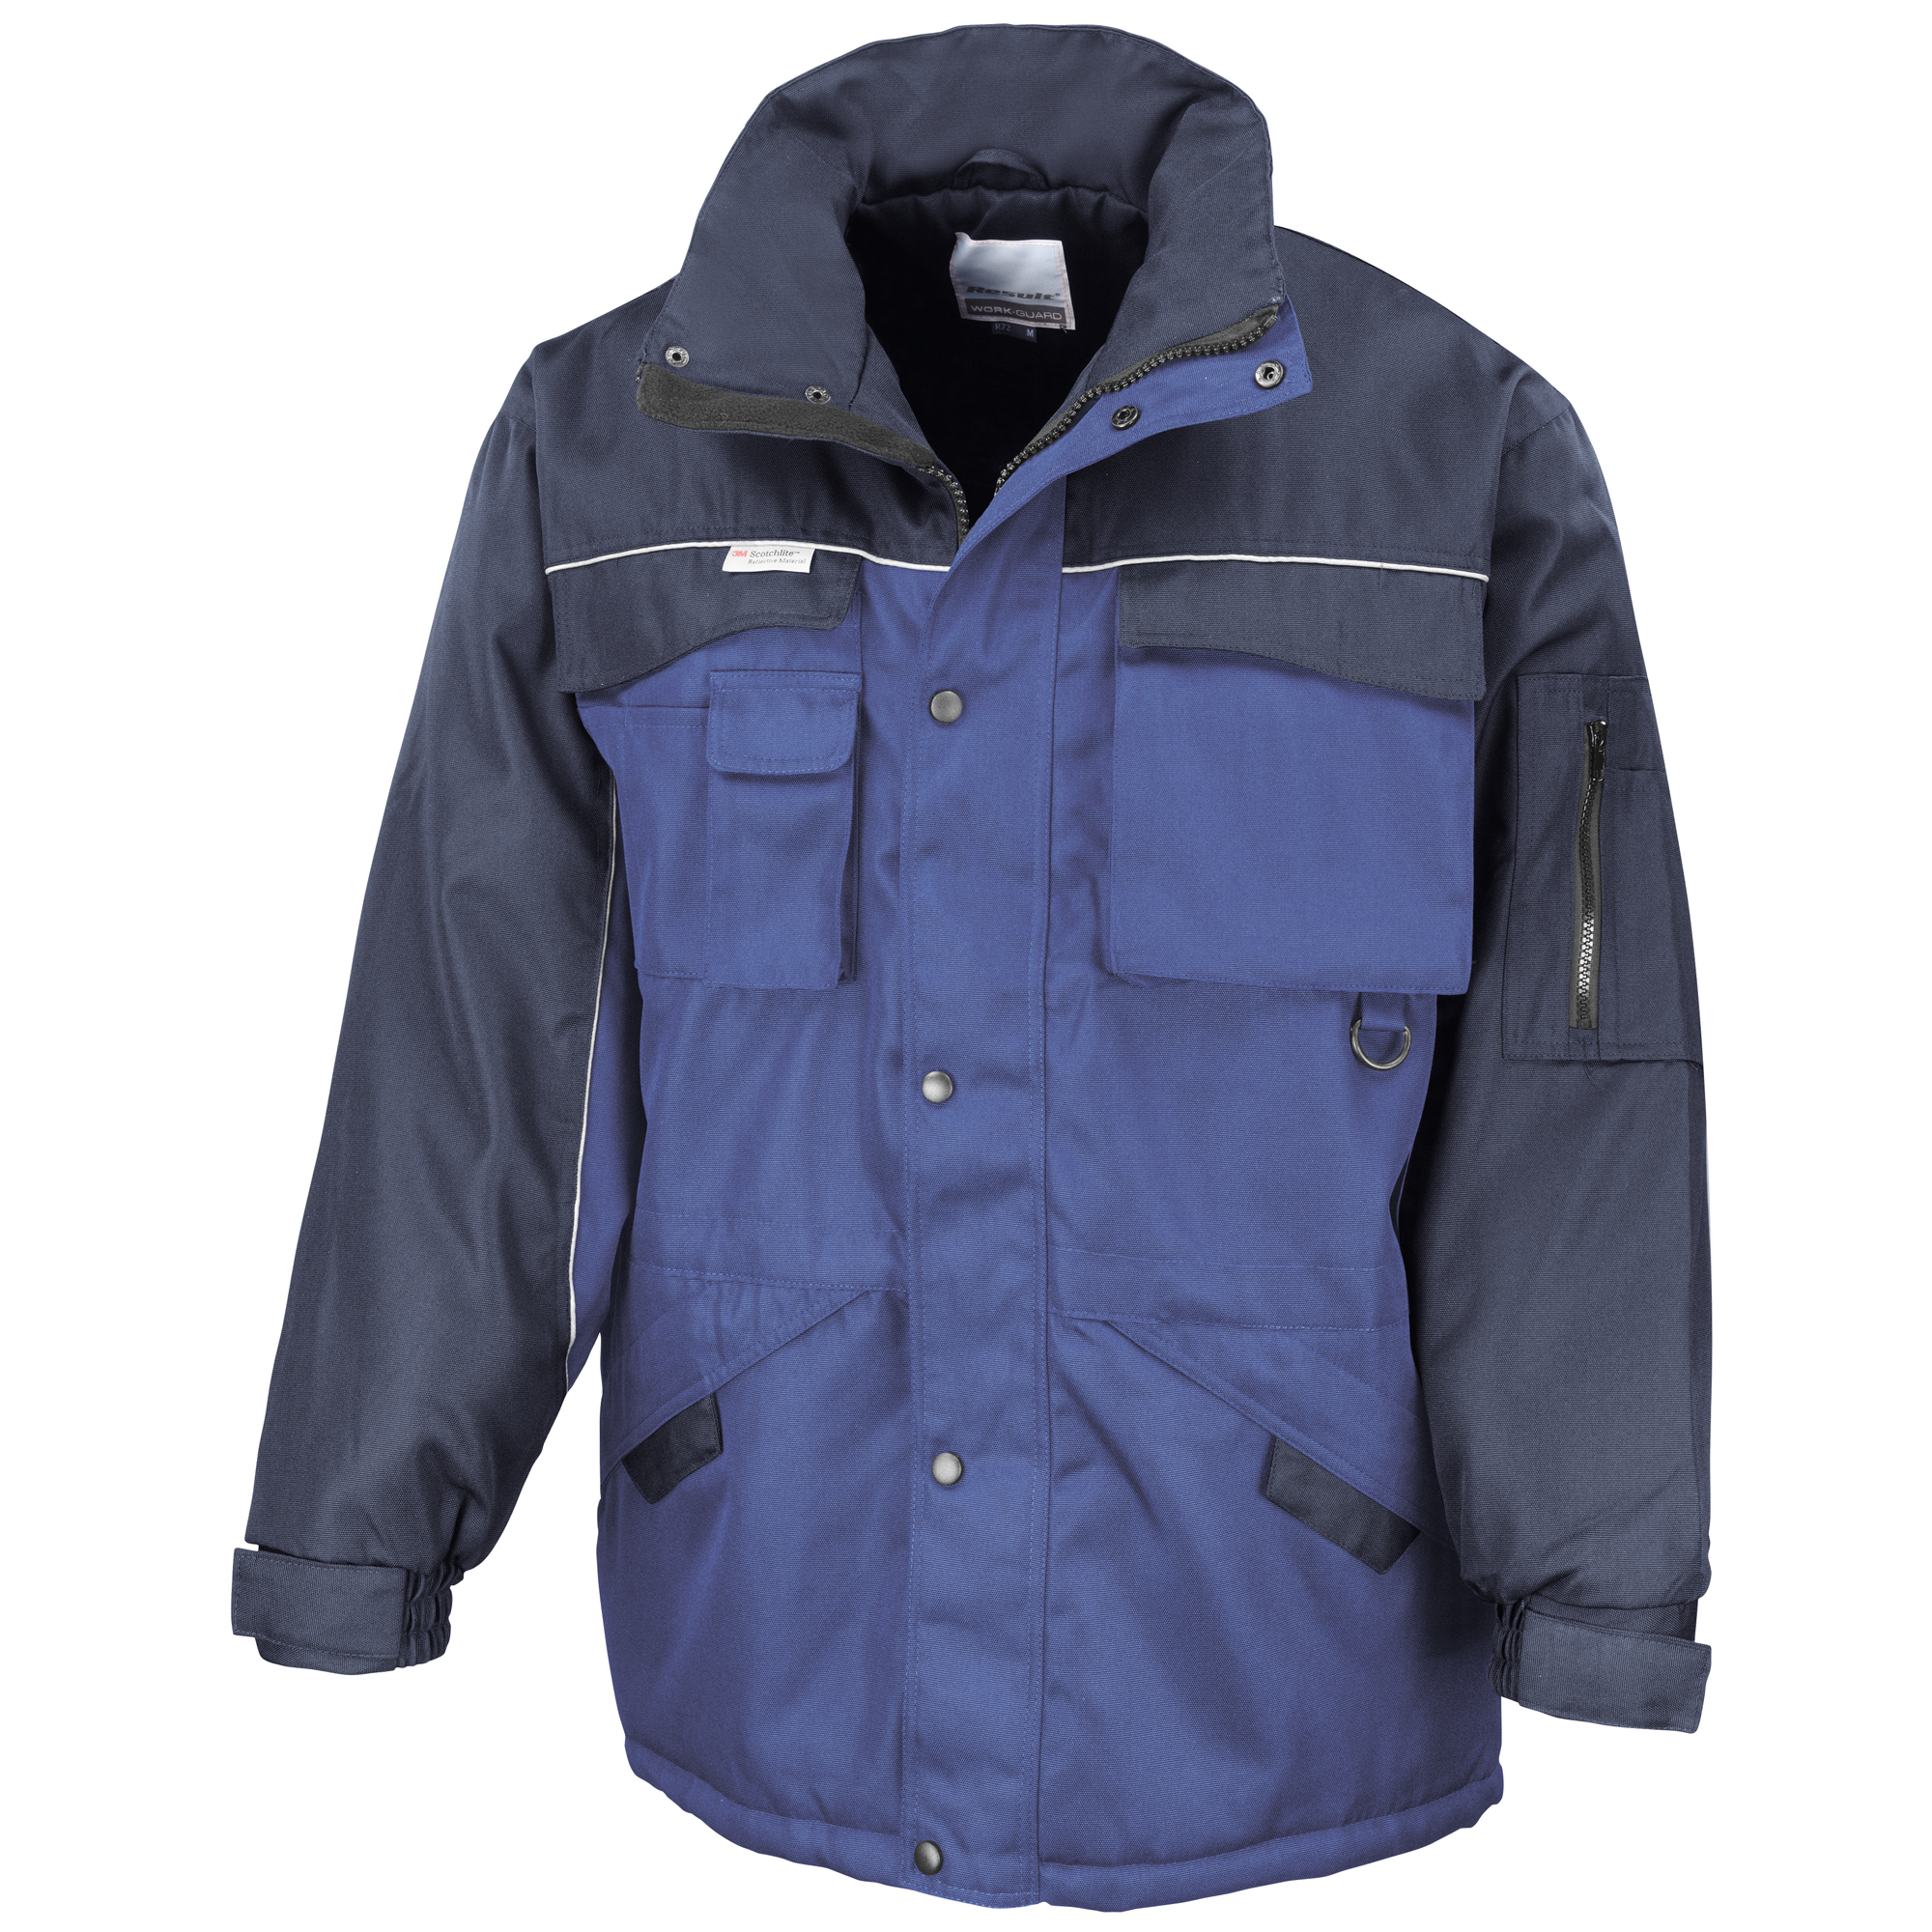 Result Mens Workwear Heavy Duty Water Repellent Windproof Combo Coat (2XL) (Royal/Navy)